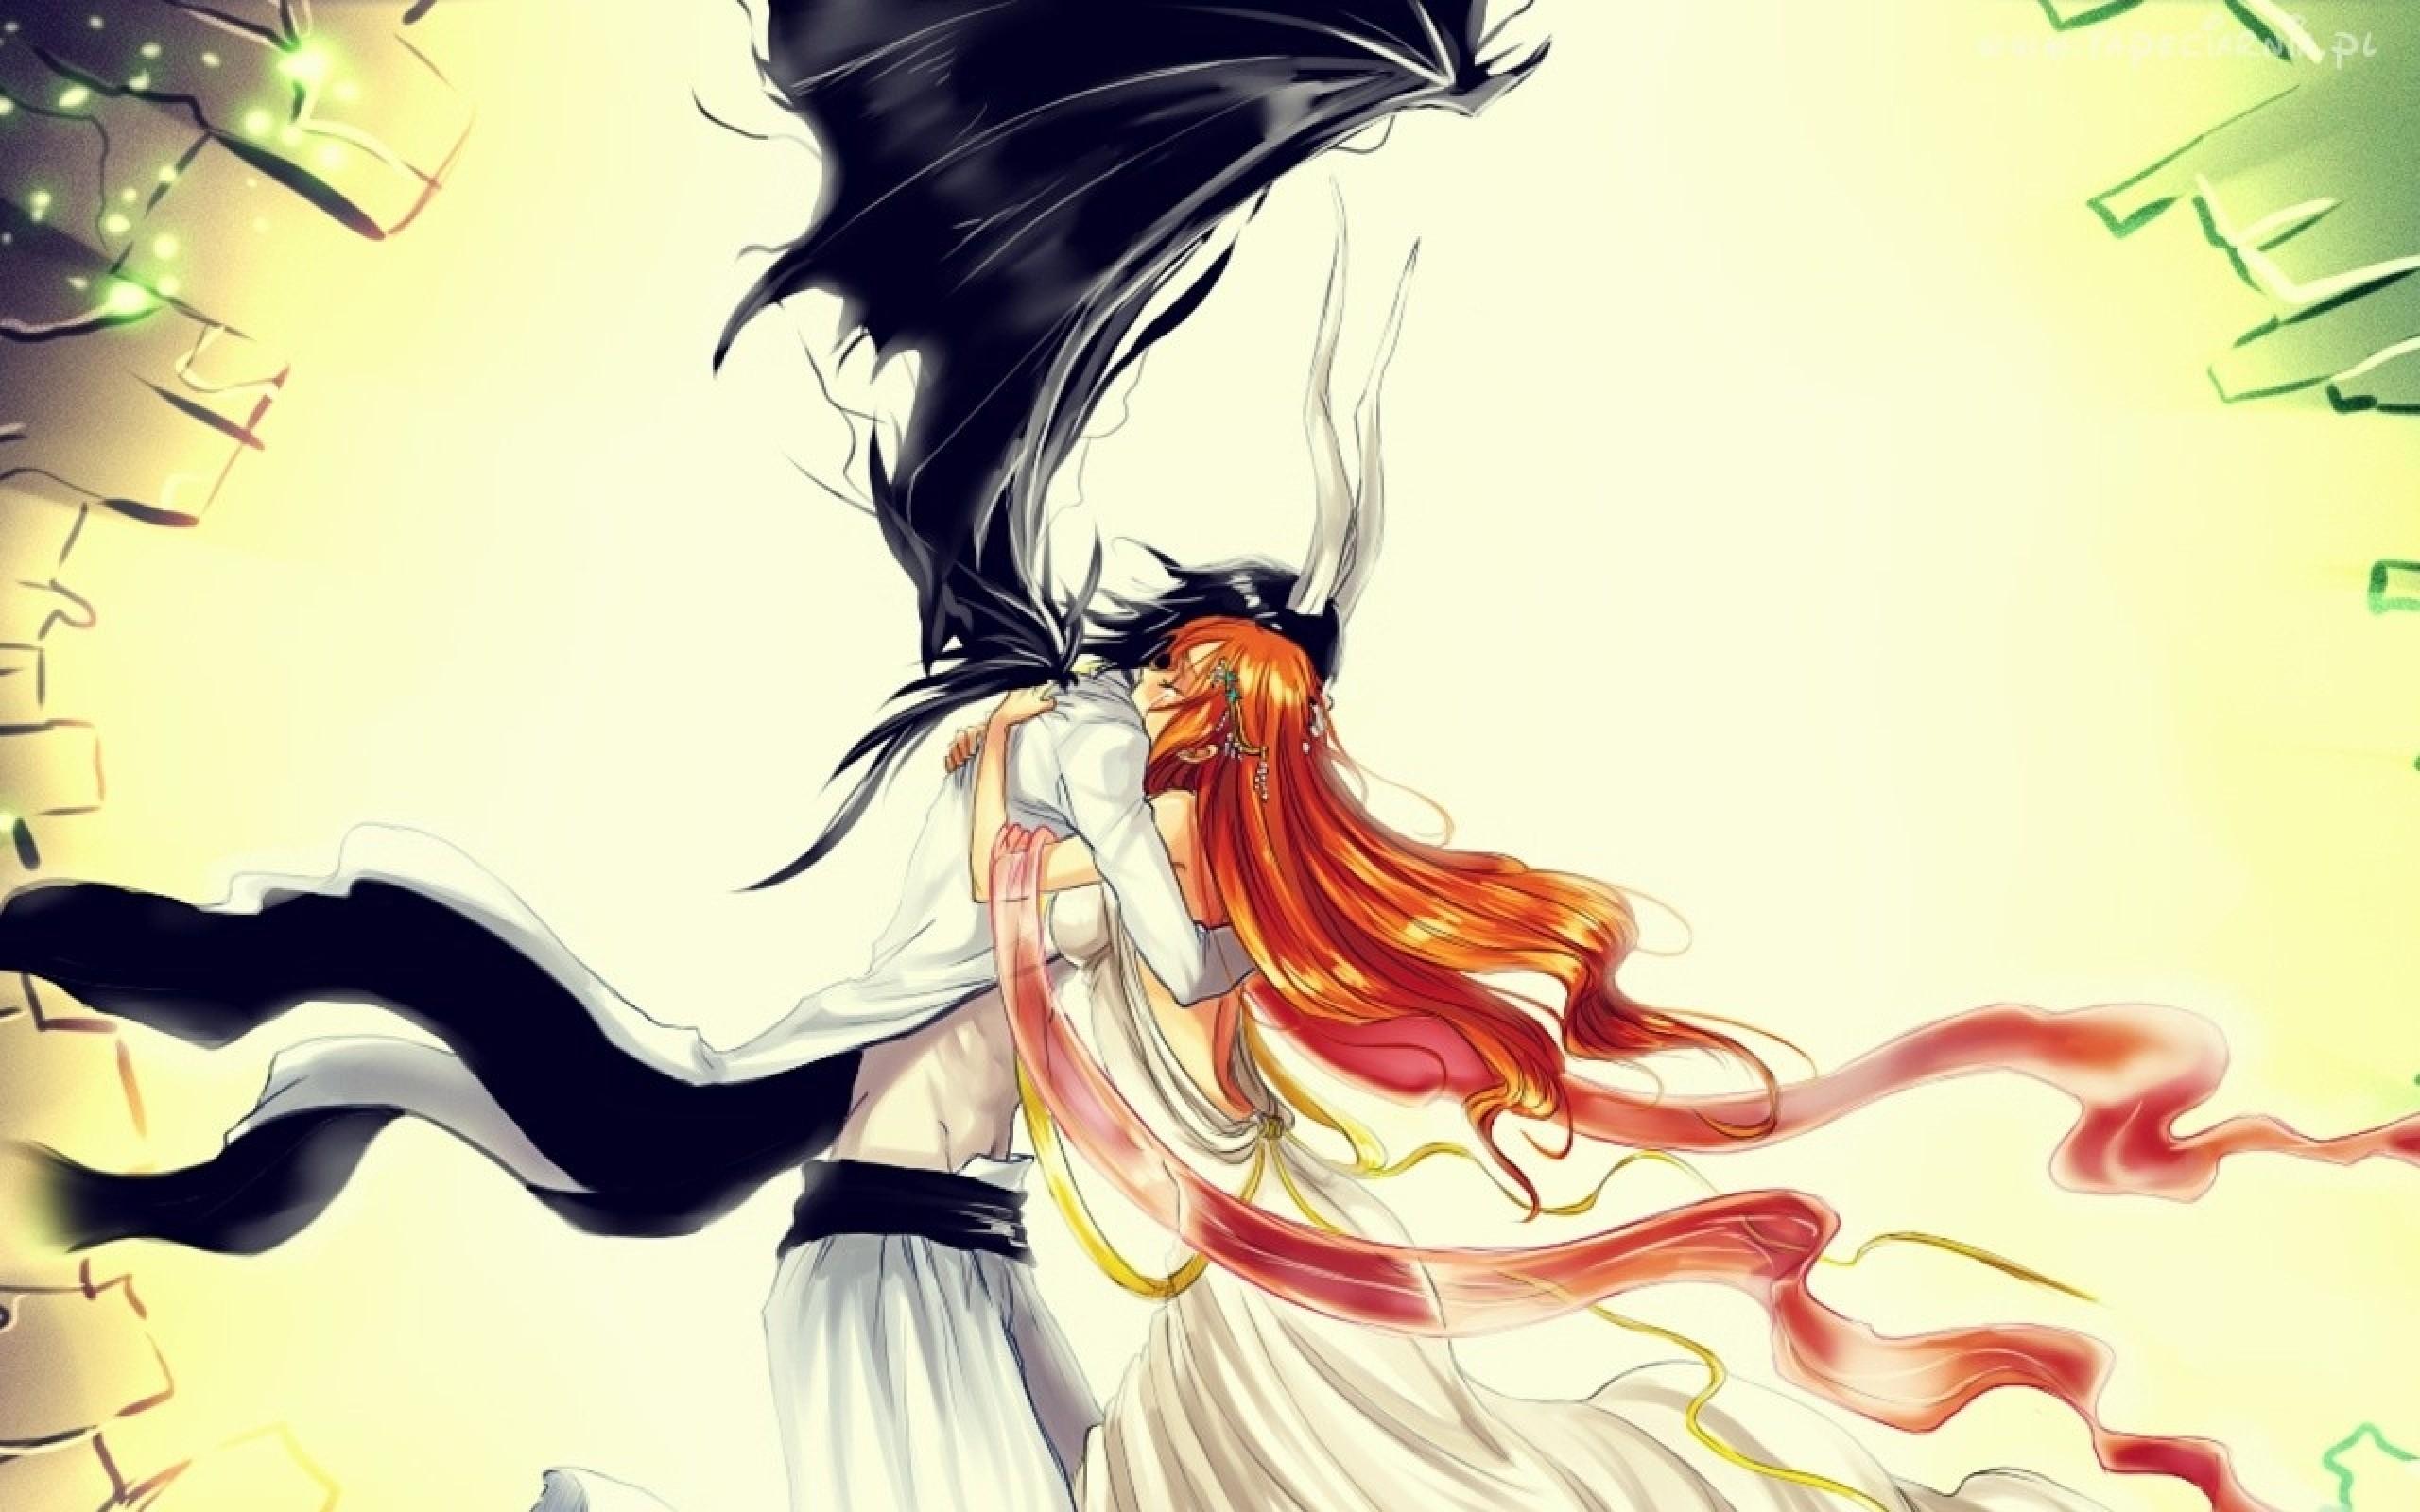 Res: 2560x1600, Anime - Bleach Anime Orihime Inoue Ulquiorra Cifer Wallpaper